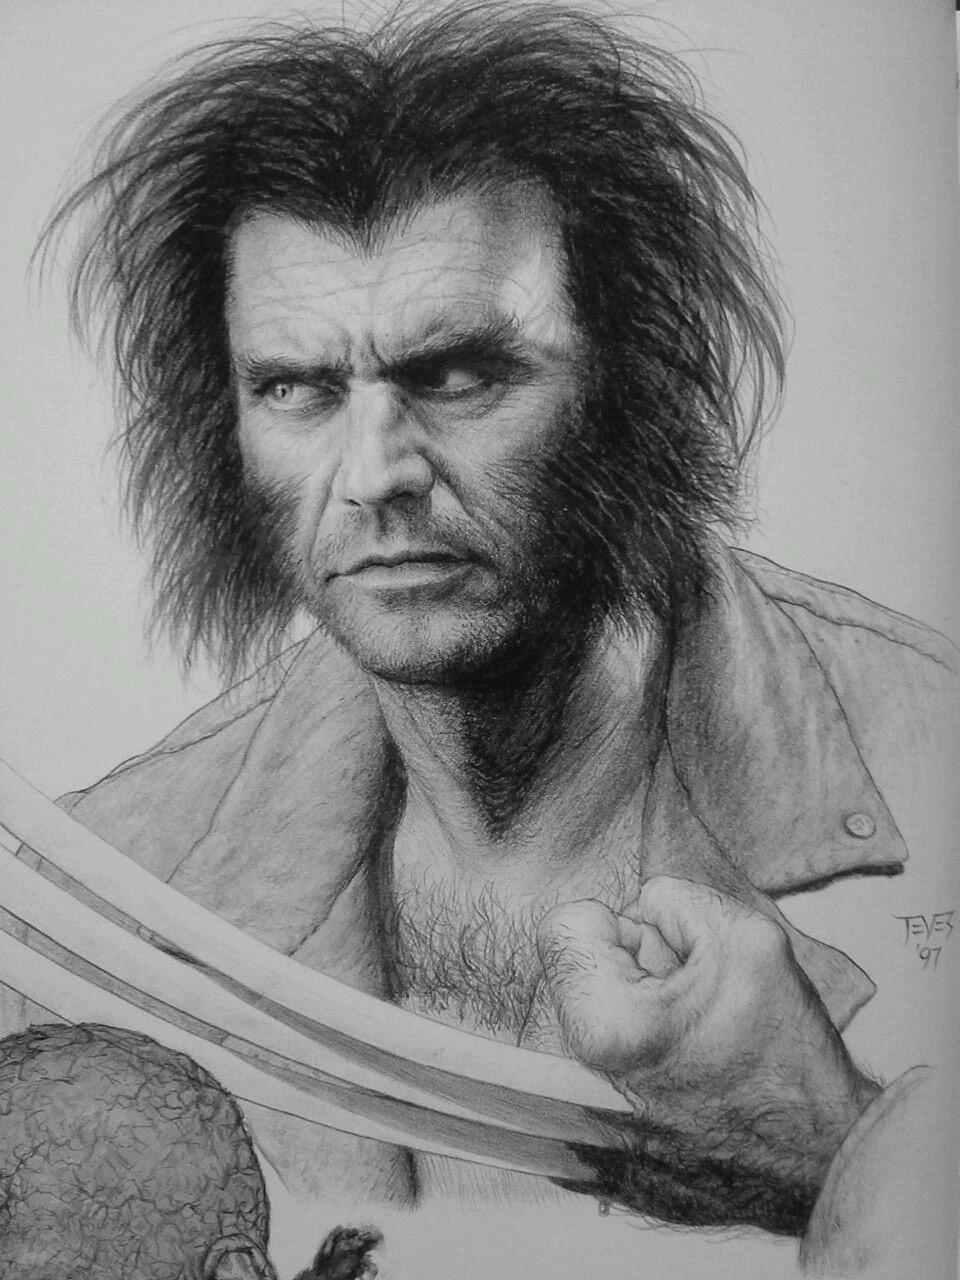 ¿Qué tal si Mel Gibson hubiera interpretado a Wolverine?. Arte conceptual por Miles Teves (1997). Imagen: Will McCrabb (@mccrabb_will).